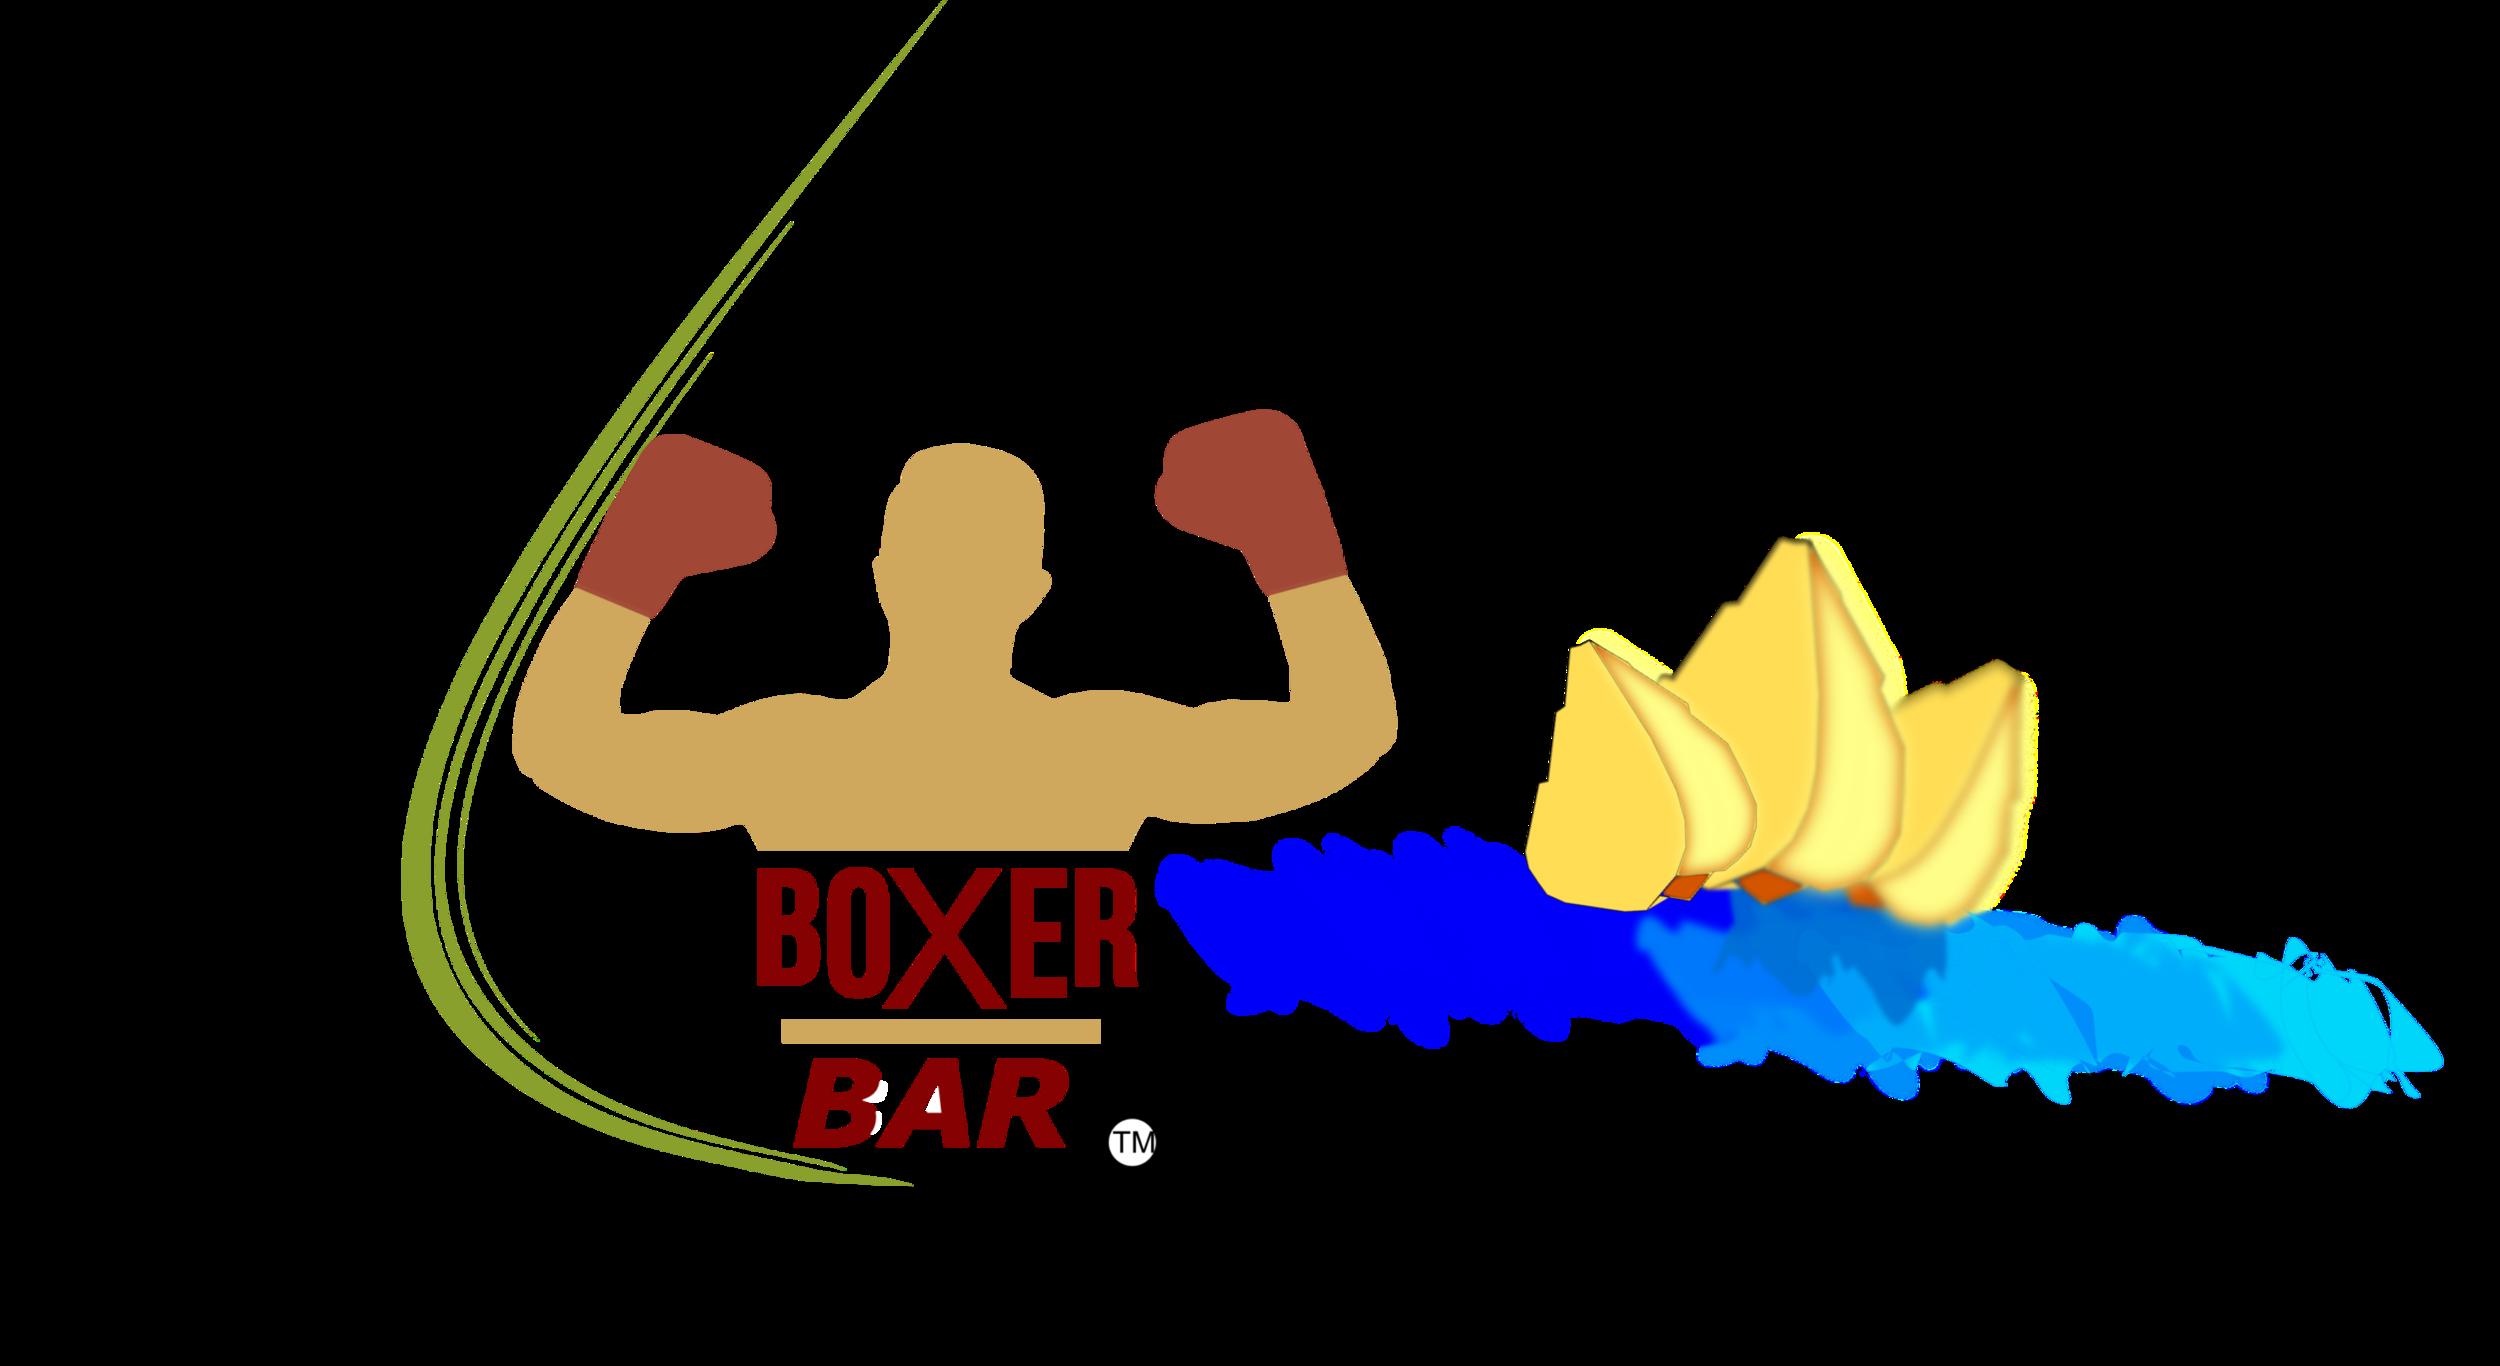 sticker_BoxerBAR.png